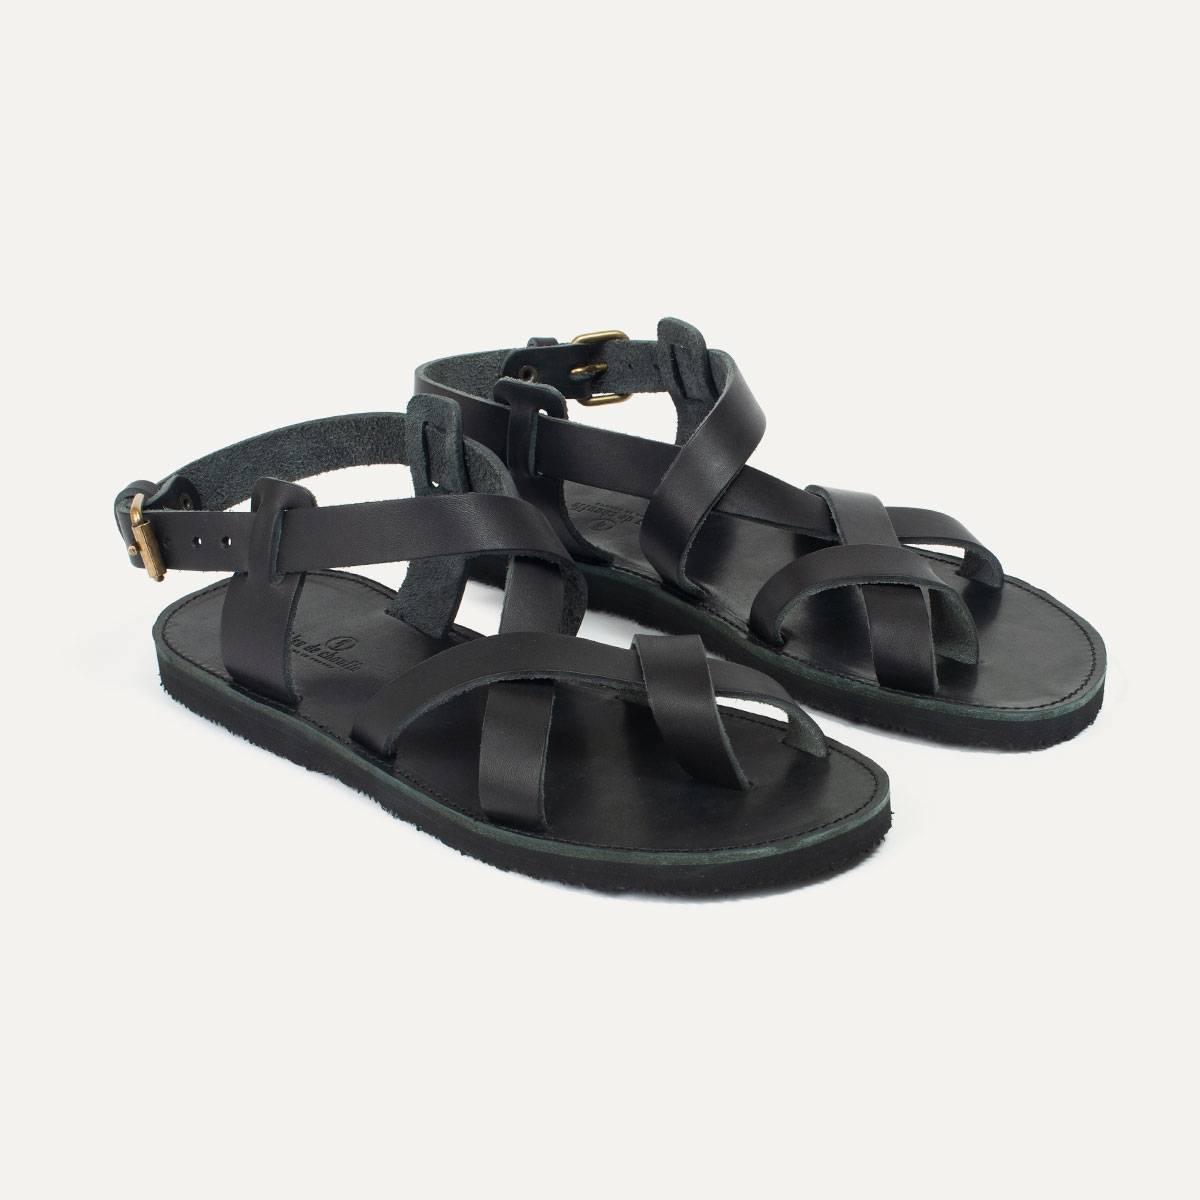 Lhassa leather sandals - Black (image n°5)